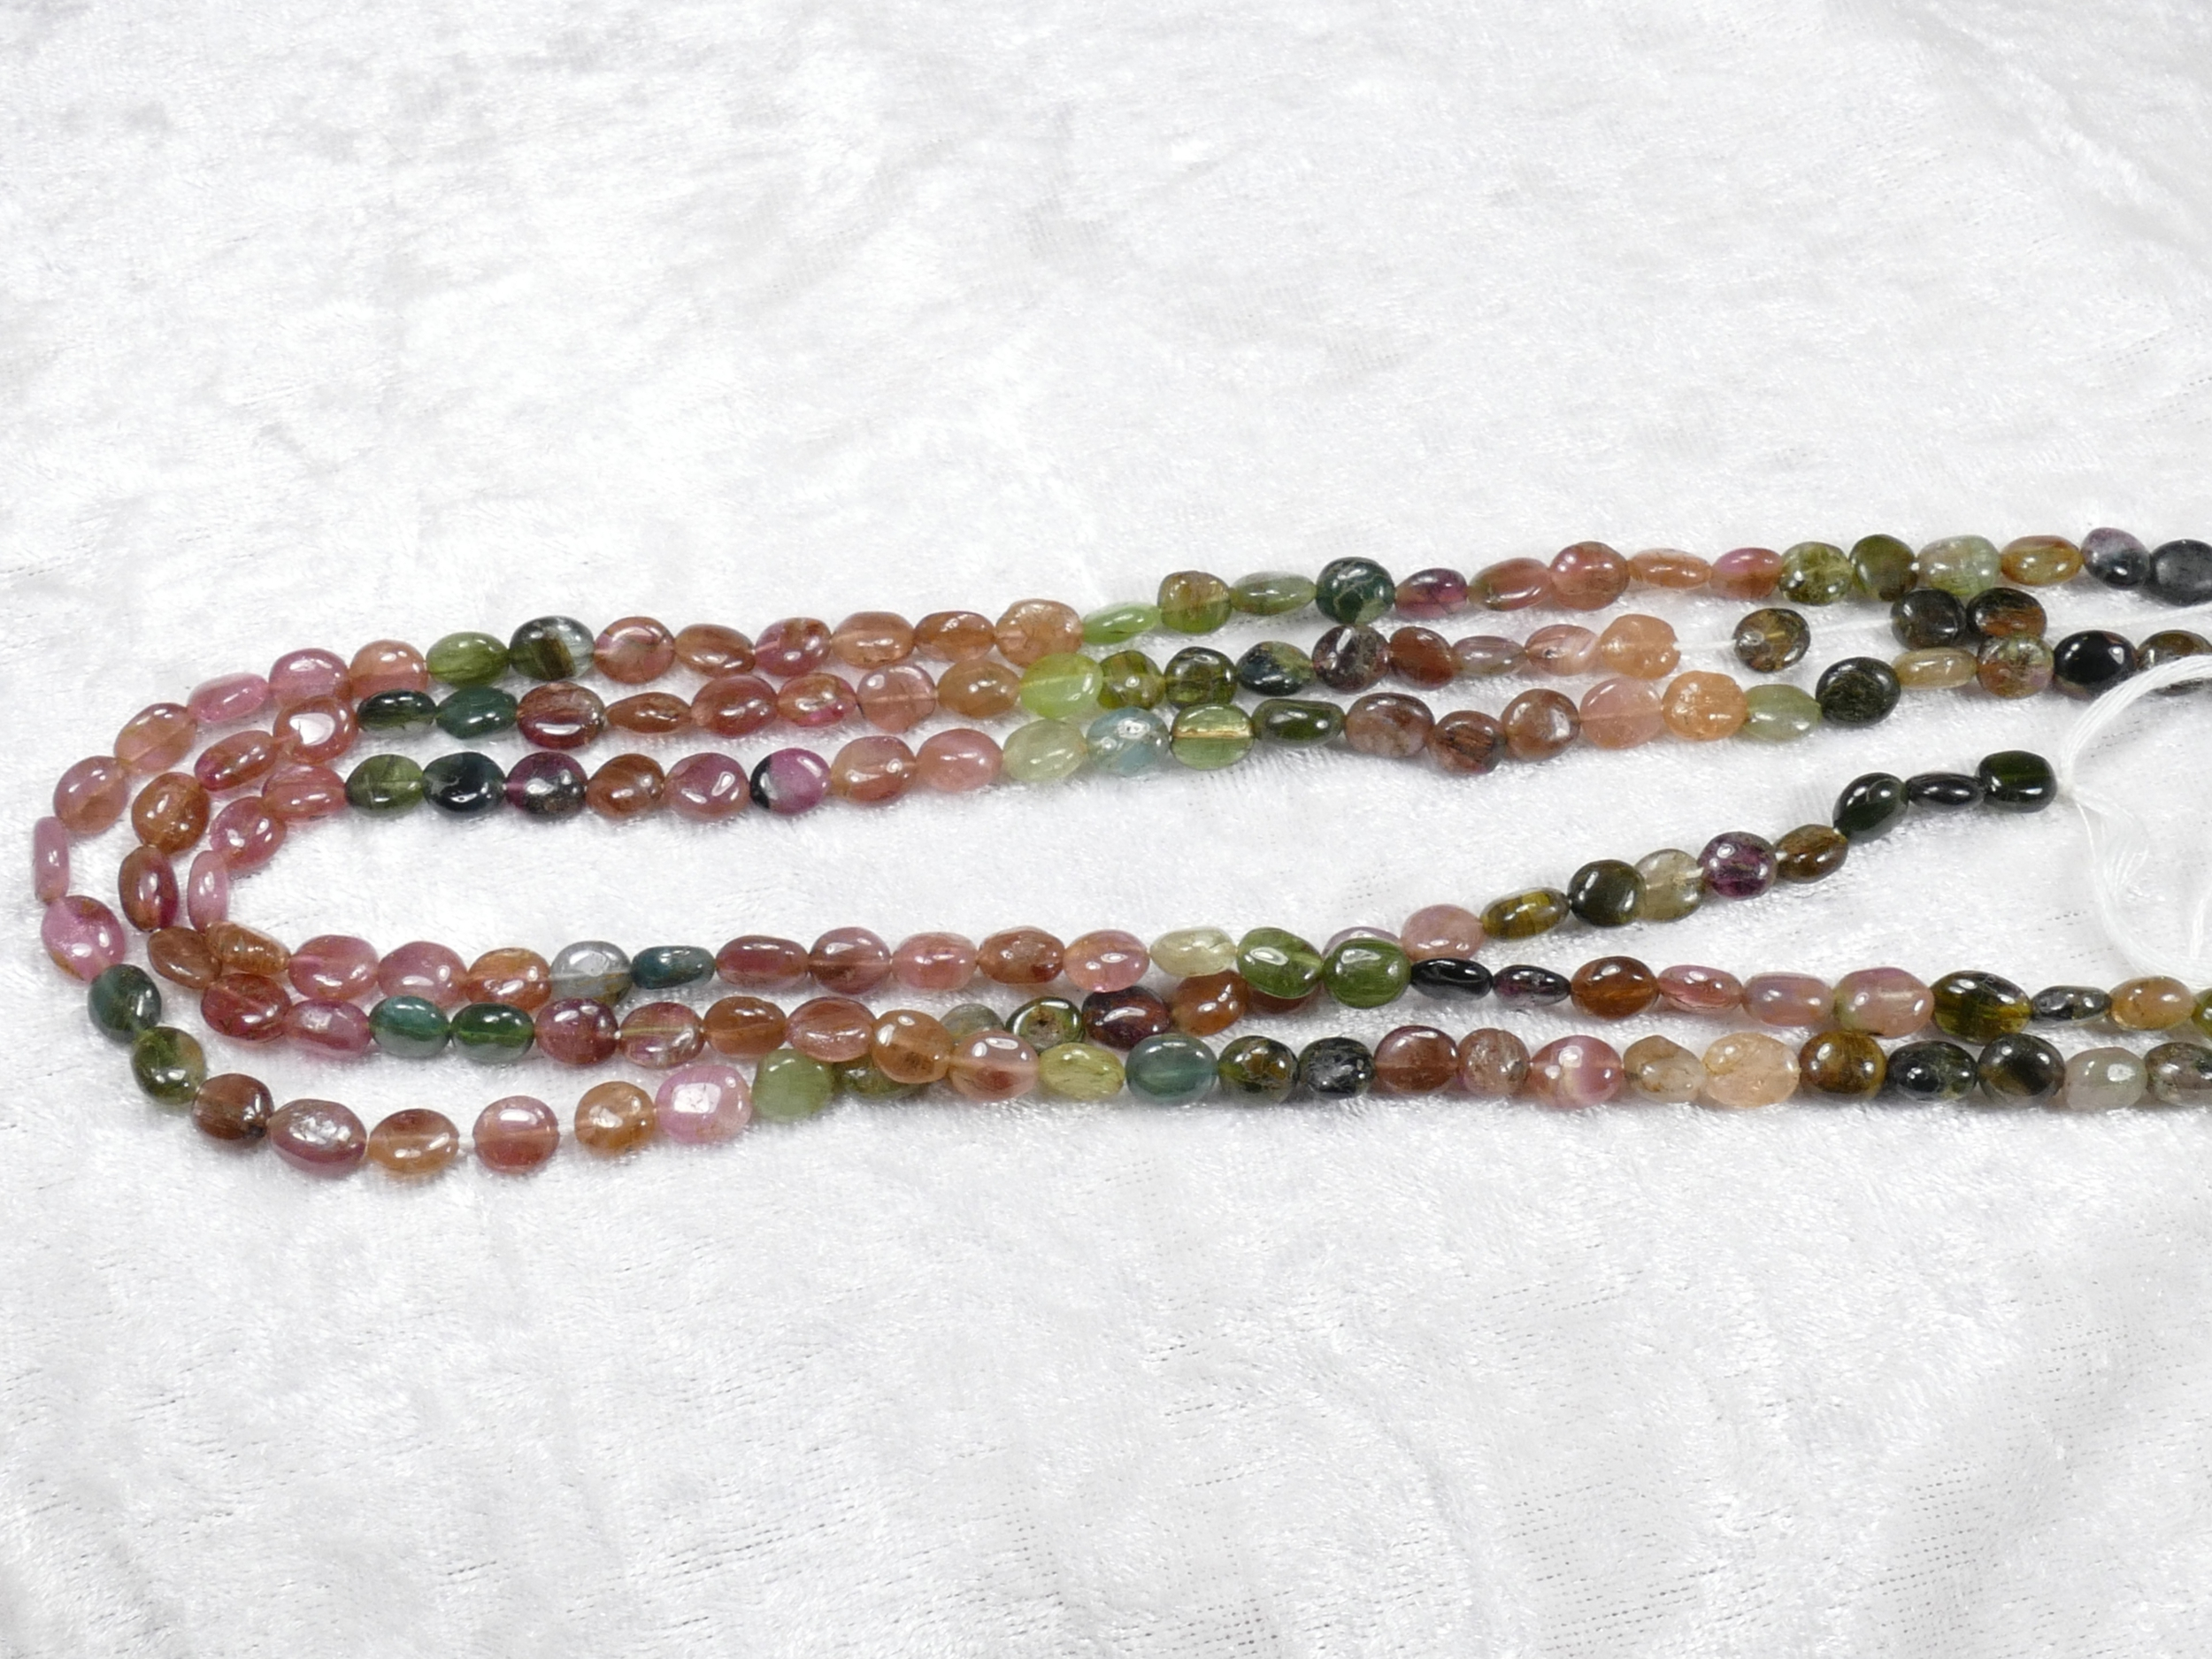 Perles de Tourmaline naturelle en ovale lisse mix rose vert x36cm (14.1inch) (#AC989)